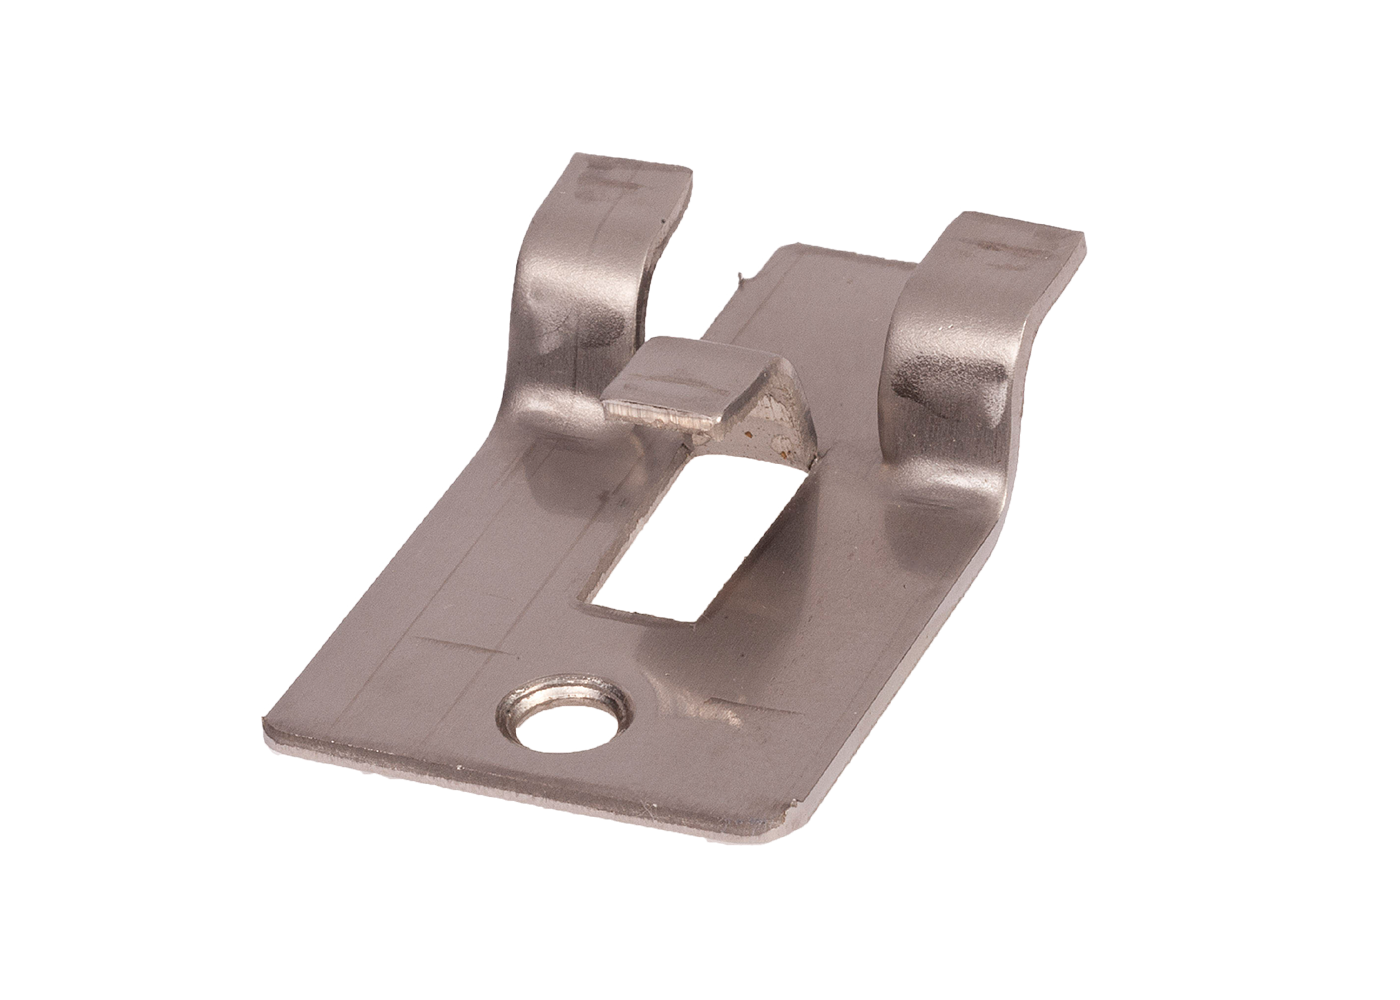 Fixations invisibles bois composite accessoires bois composite accessoir - Clips pour terrasse composite ...